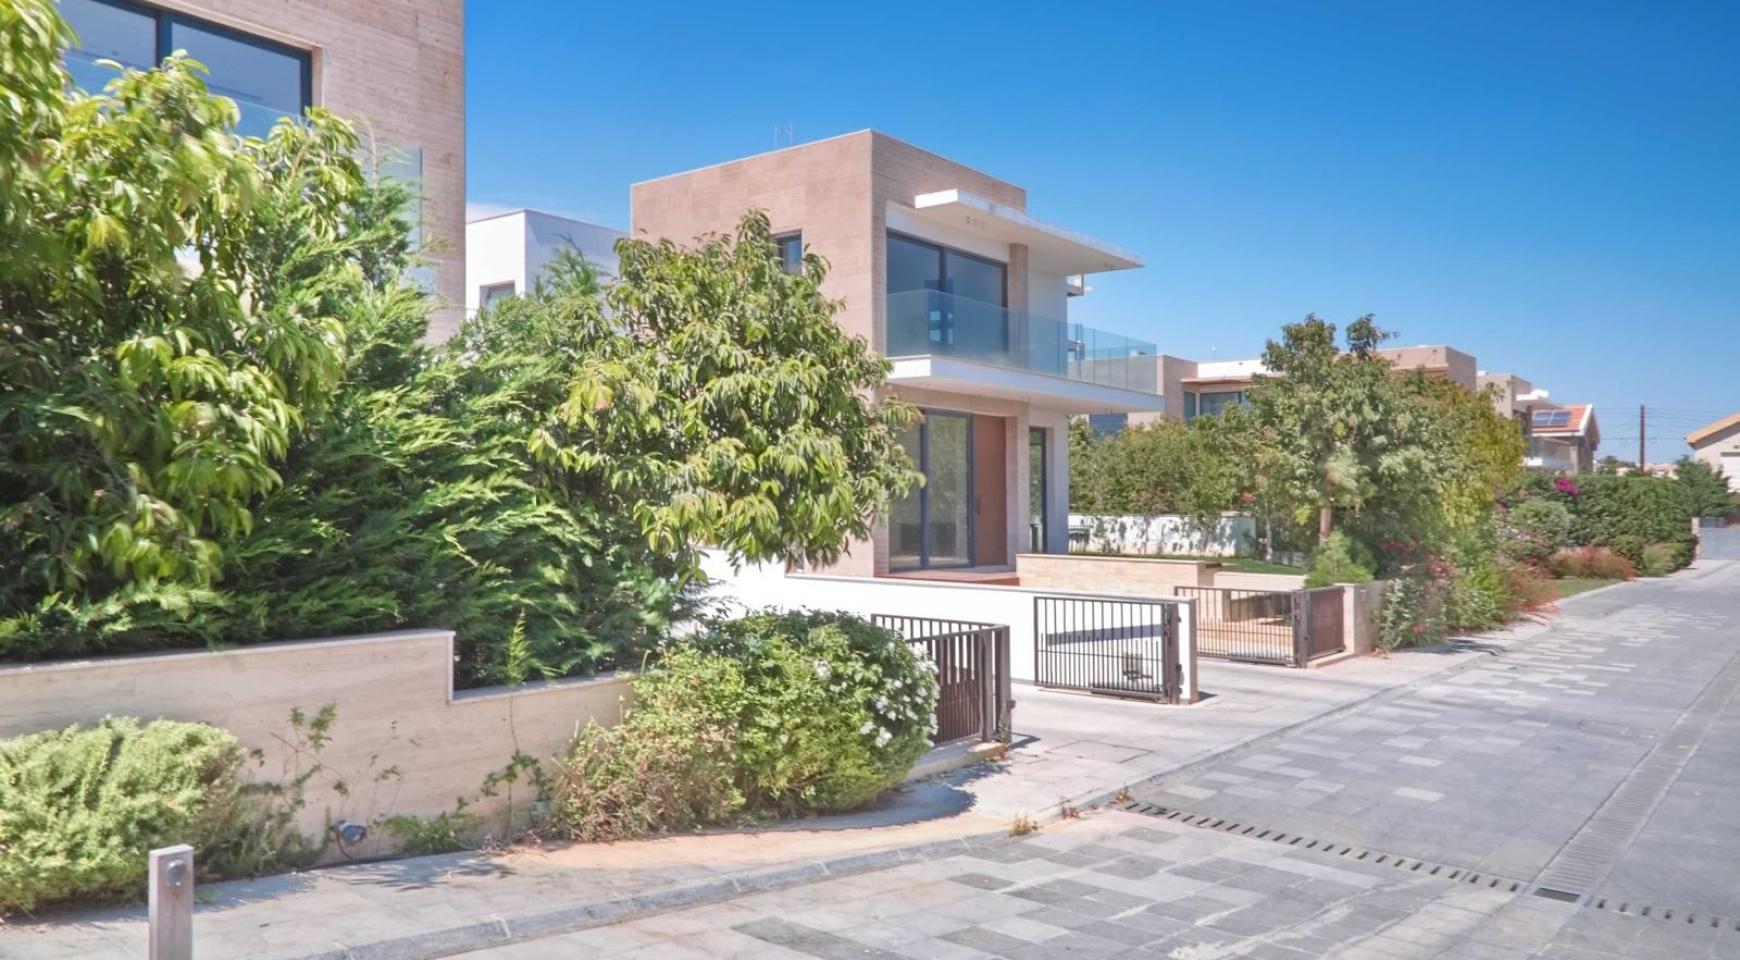 New Luxurious 4 Bedroom Villa in the Tourist Area - 15